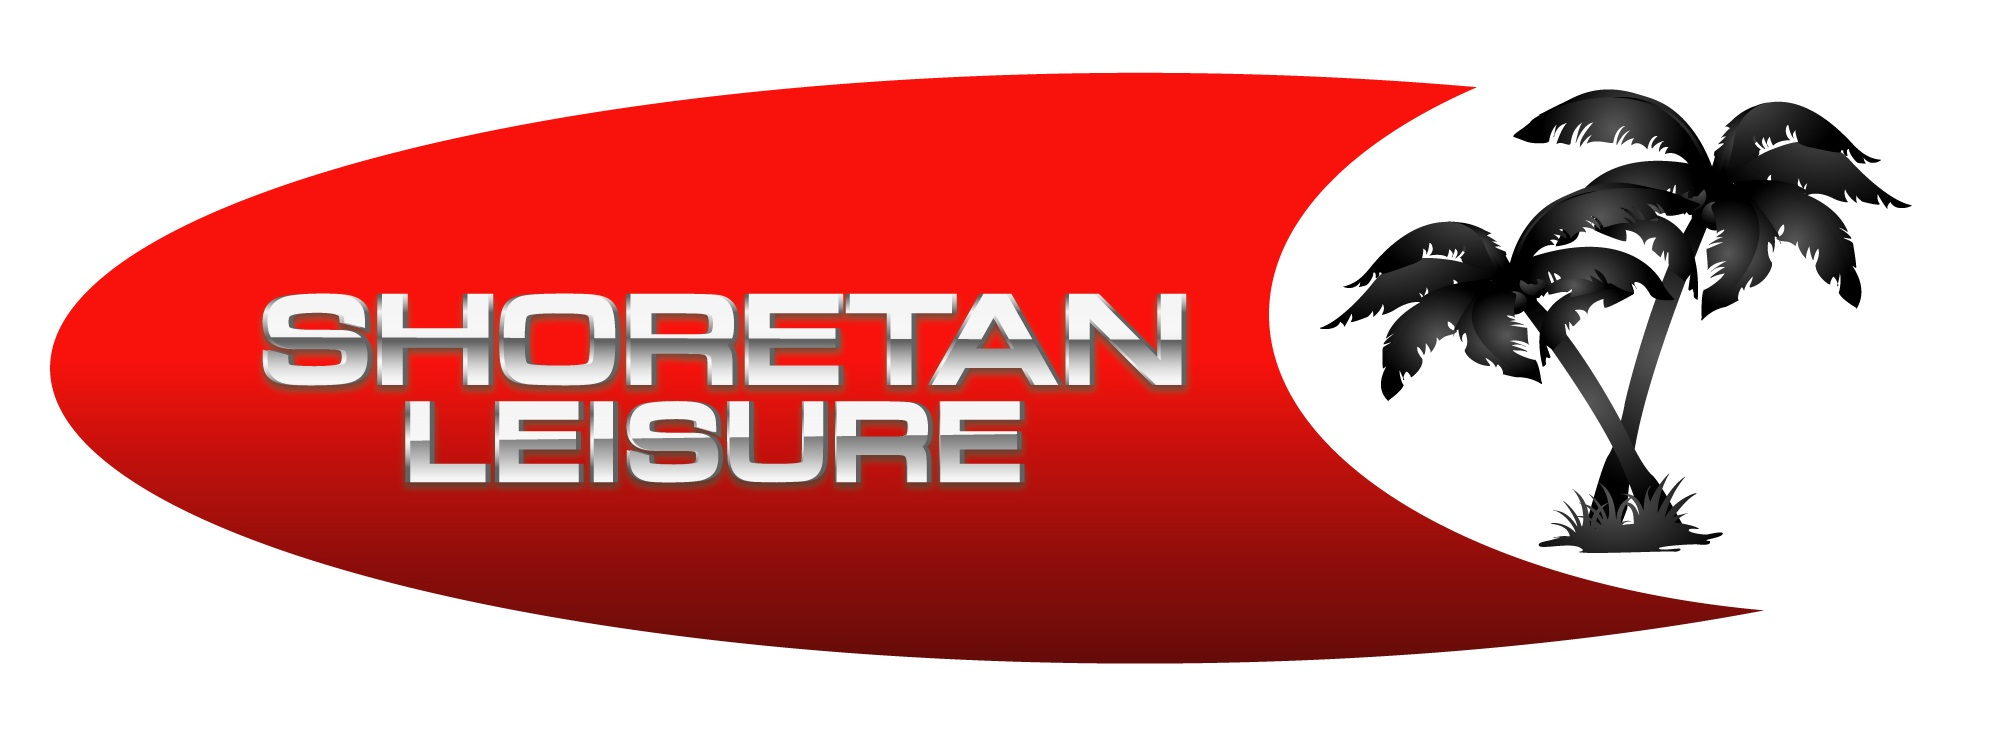 Shoretan Leisure UK